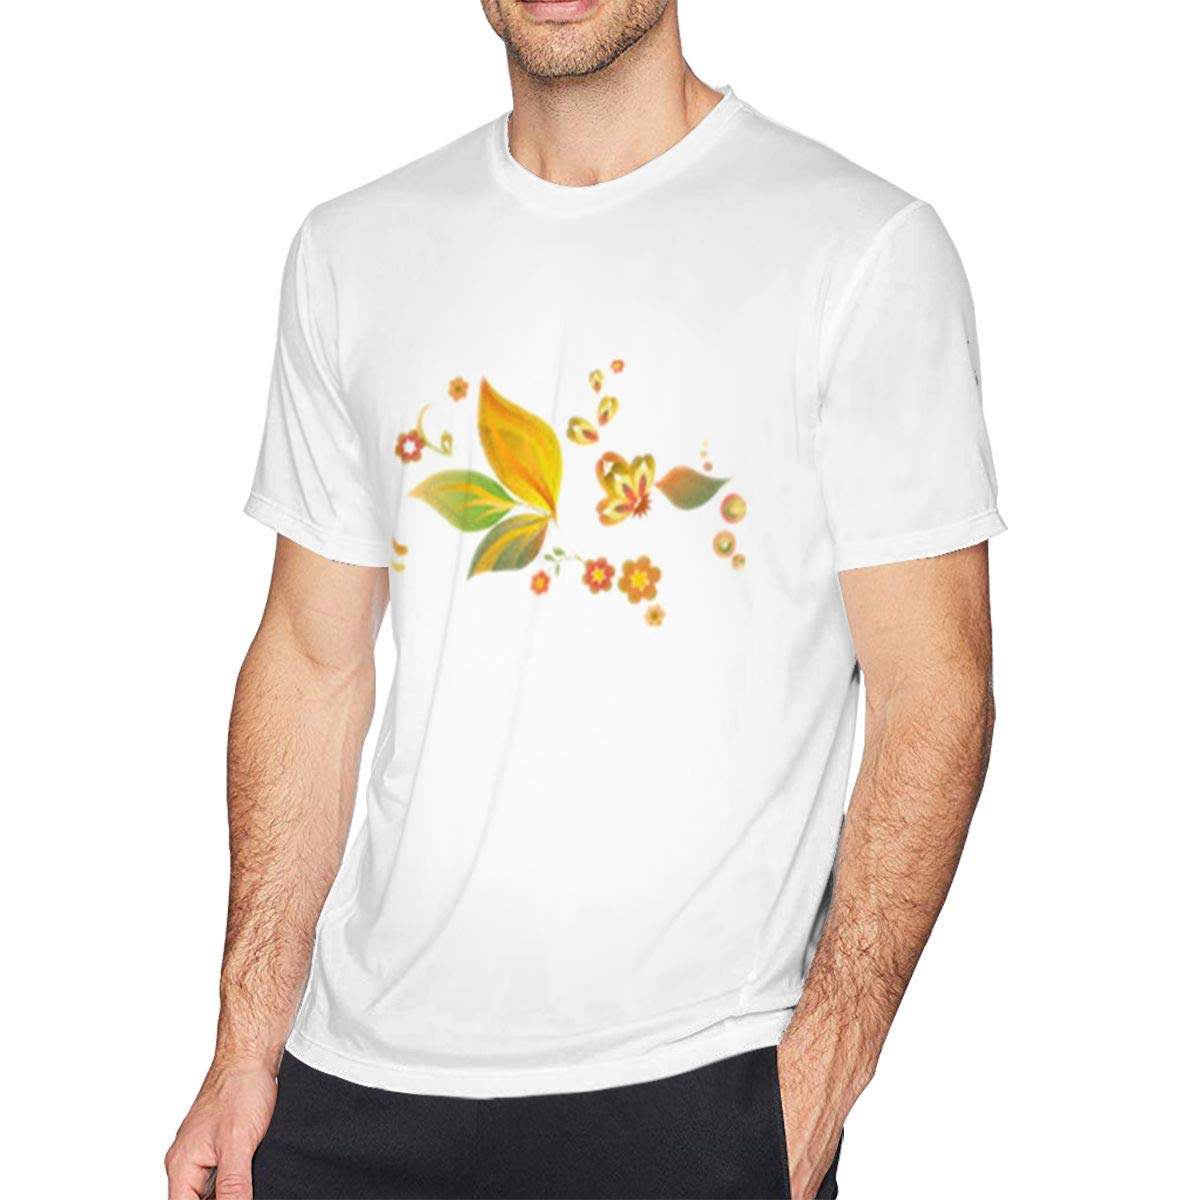 Casual Shirt for Men SUMT4men Yellow Flower Mens Crew Neck Short Sleeve T-Shirt